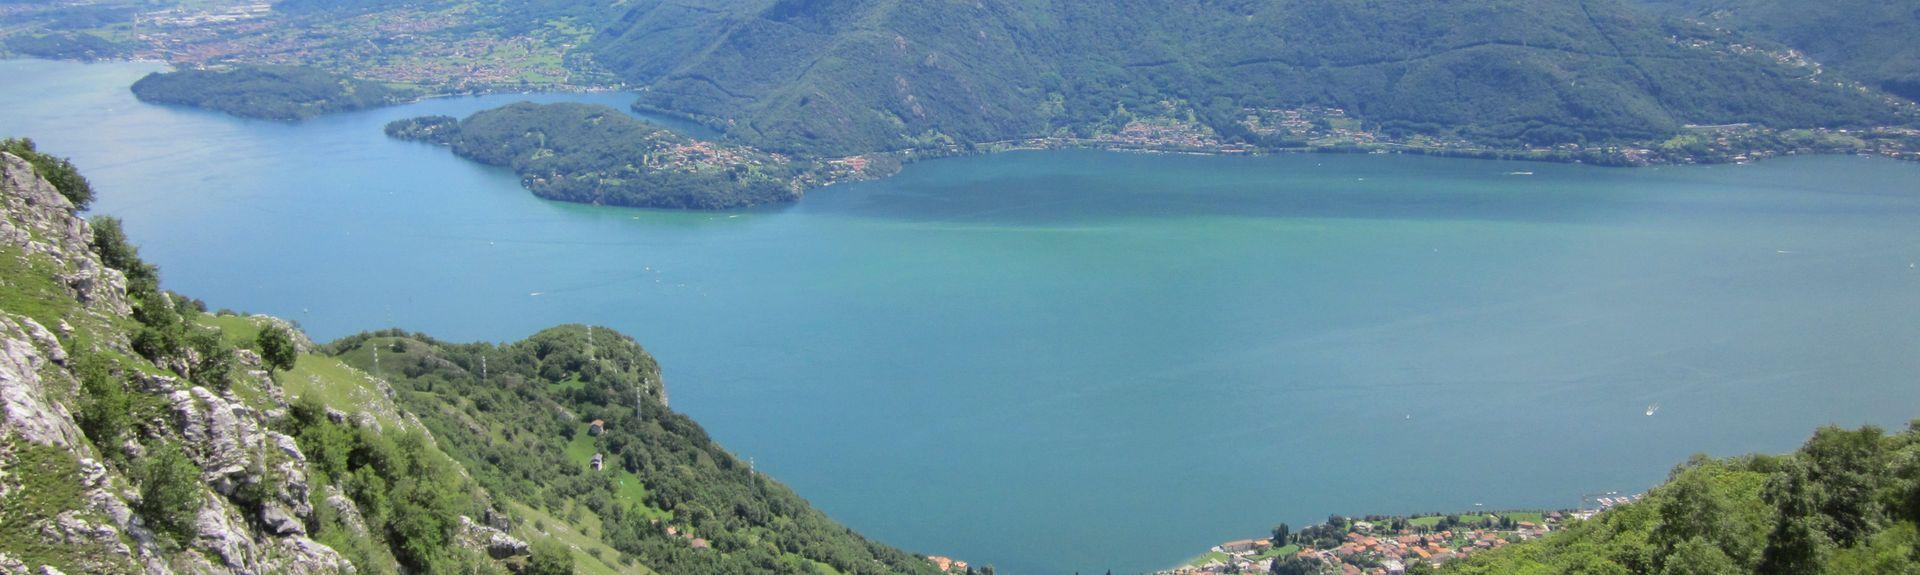 San Gregorio, Gravedona, Lombardie, Italie